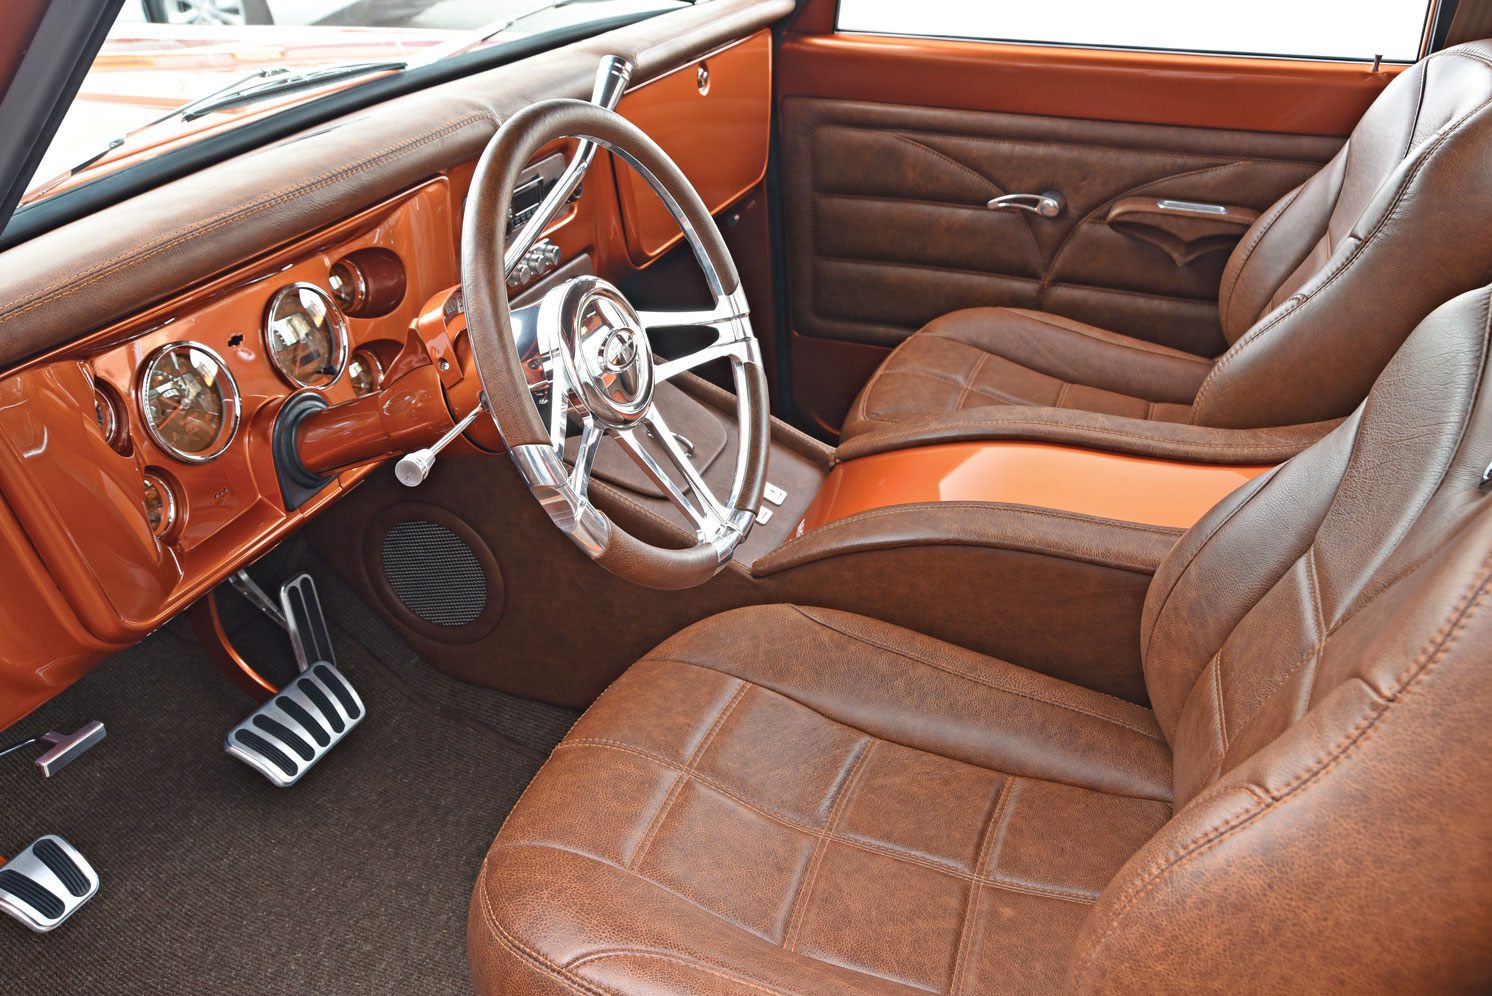 008-Chevy-C10-Interior-restoration